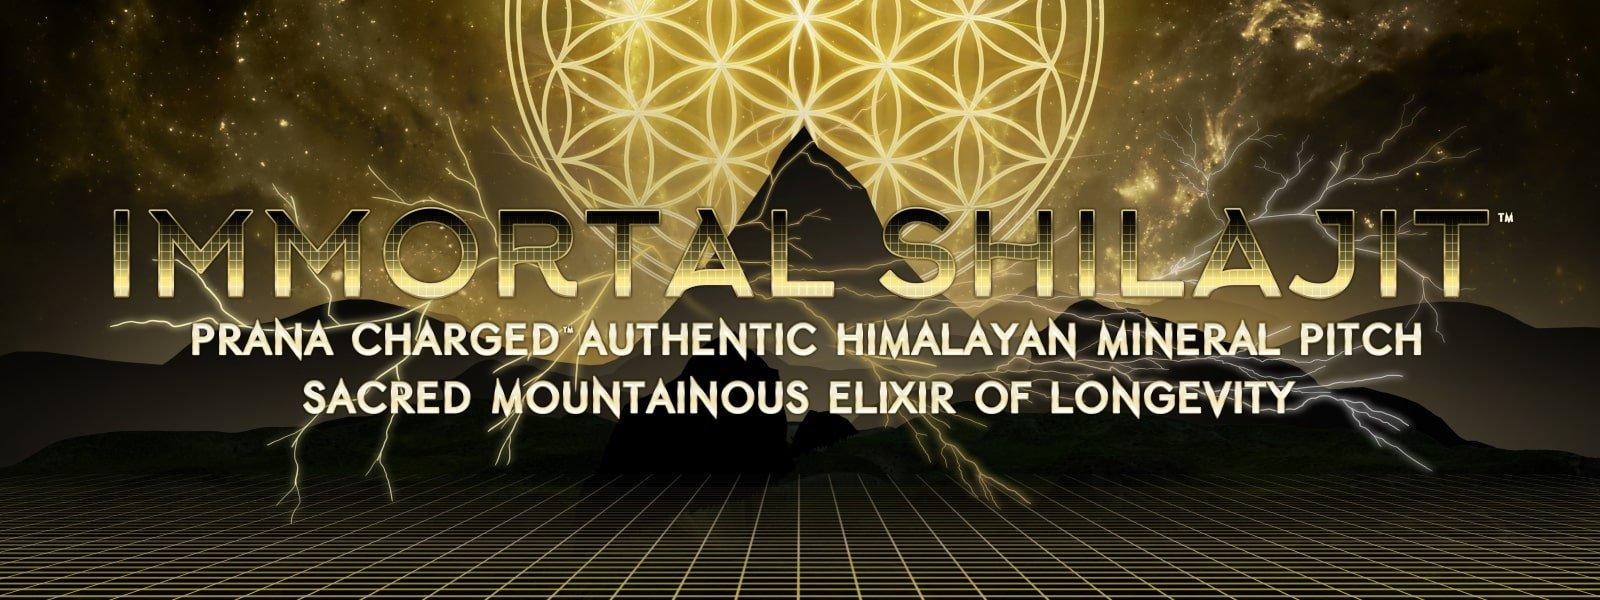 immortal shilajit flower of life authentic himalayan shilajit resin